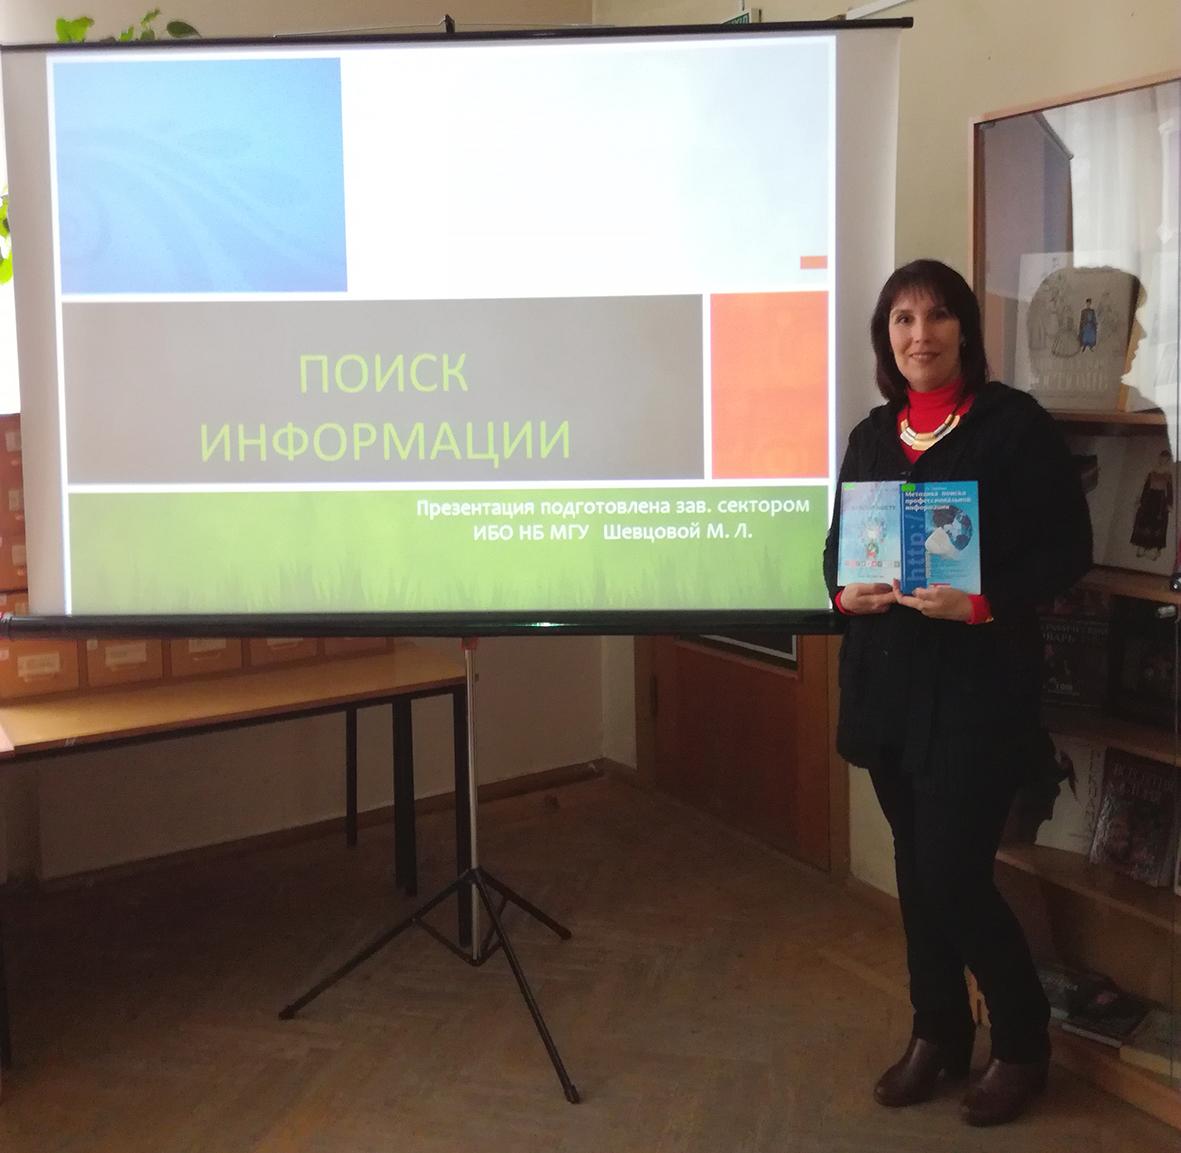 seminar_z_poshuku_informatsii